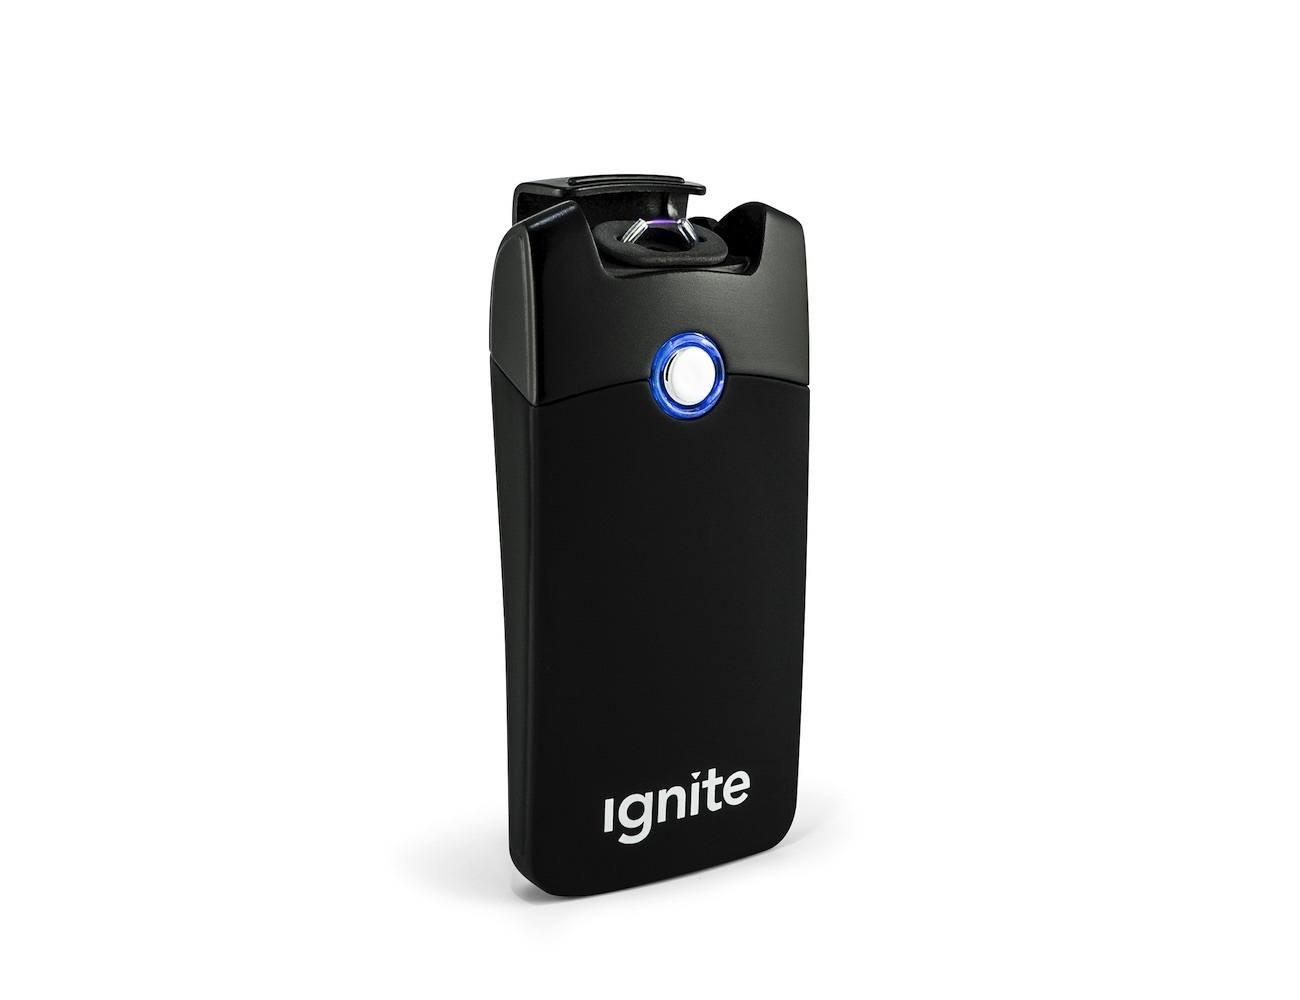 Ignite Impulse Pocket Arclighter 2